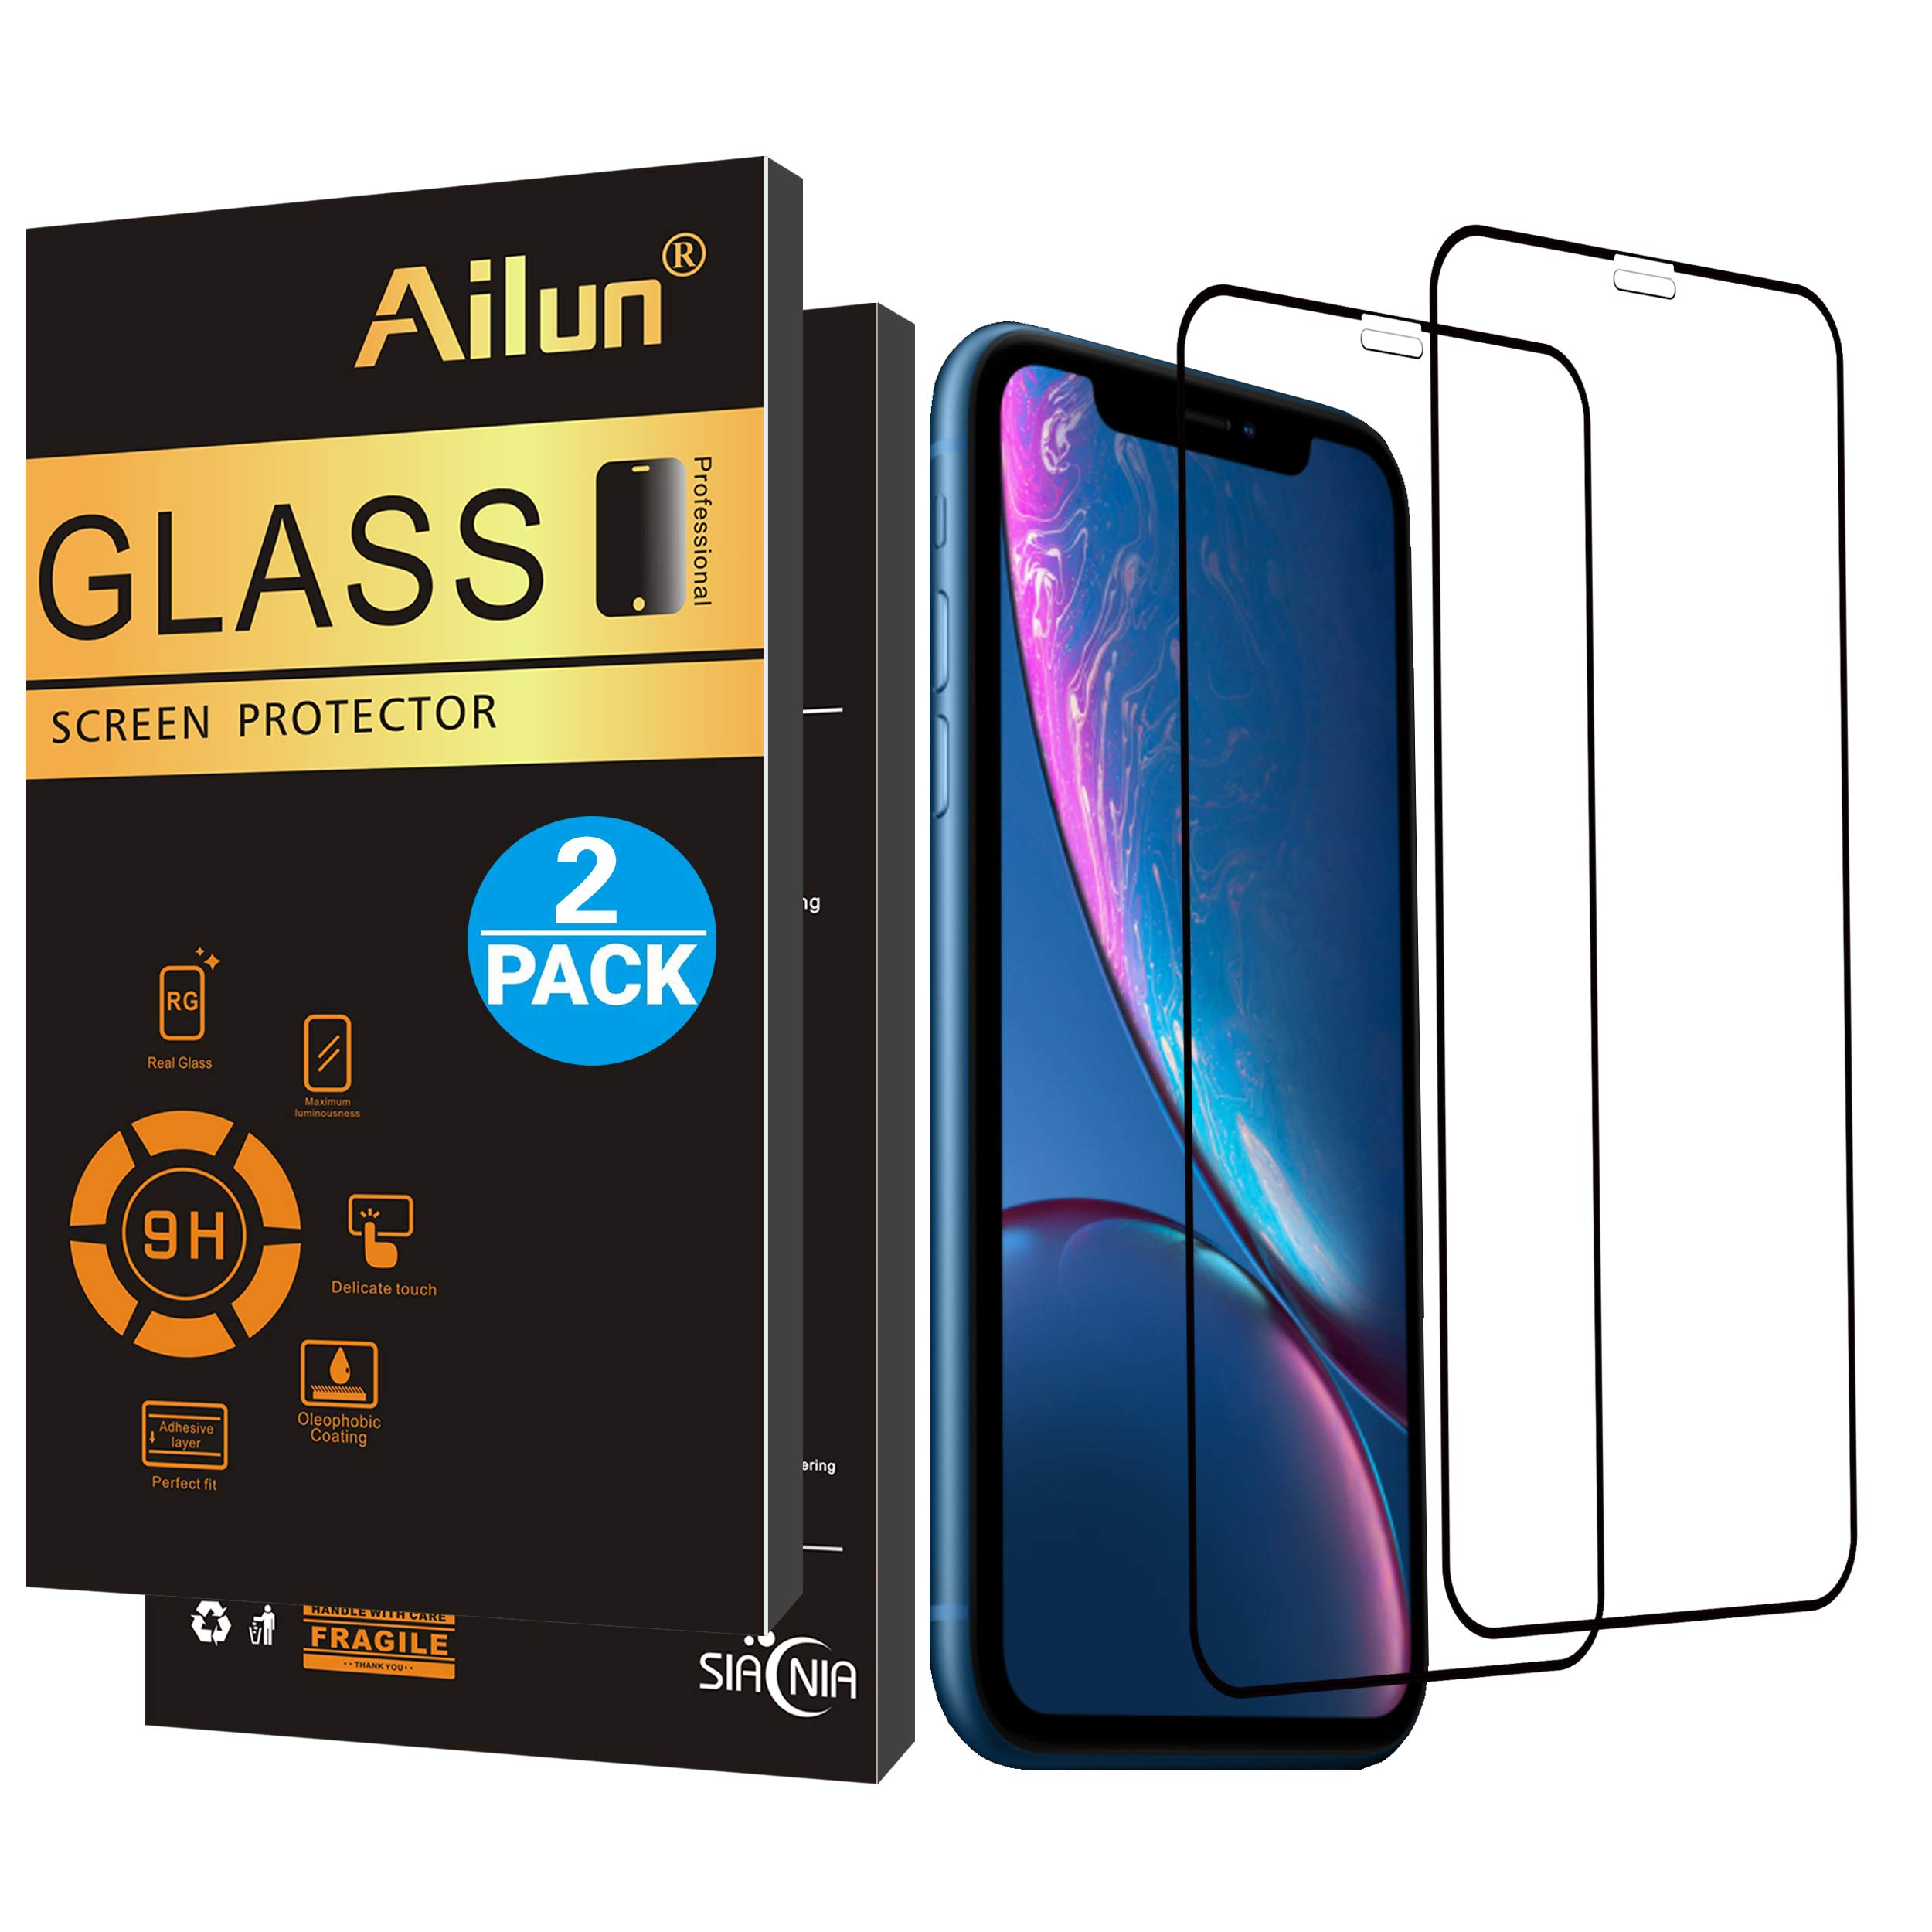 Vidrio Templado Para Iphone Xr [2 Un.] AILUN